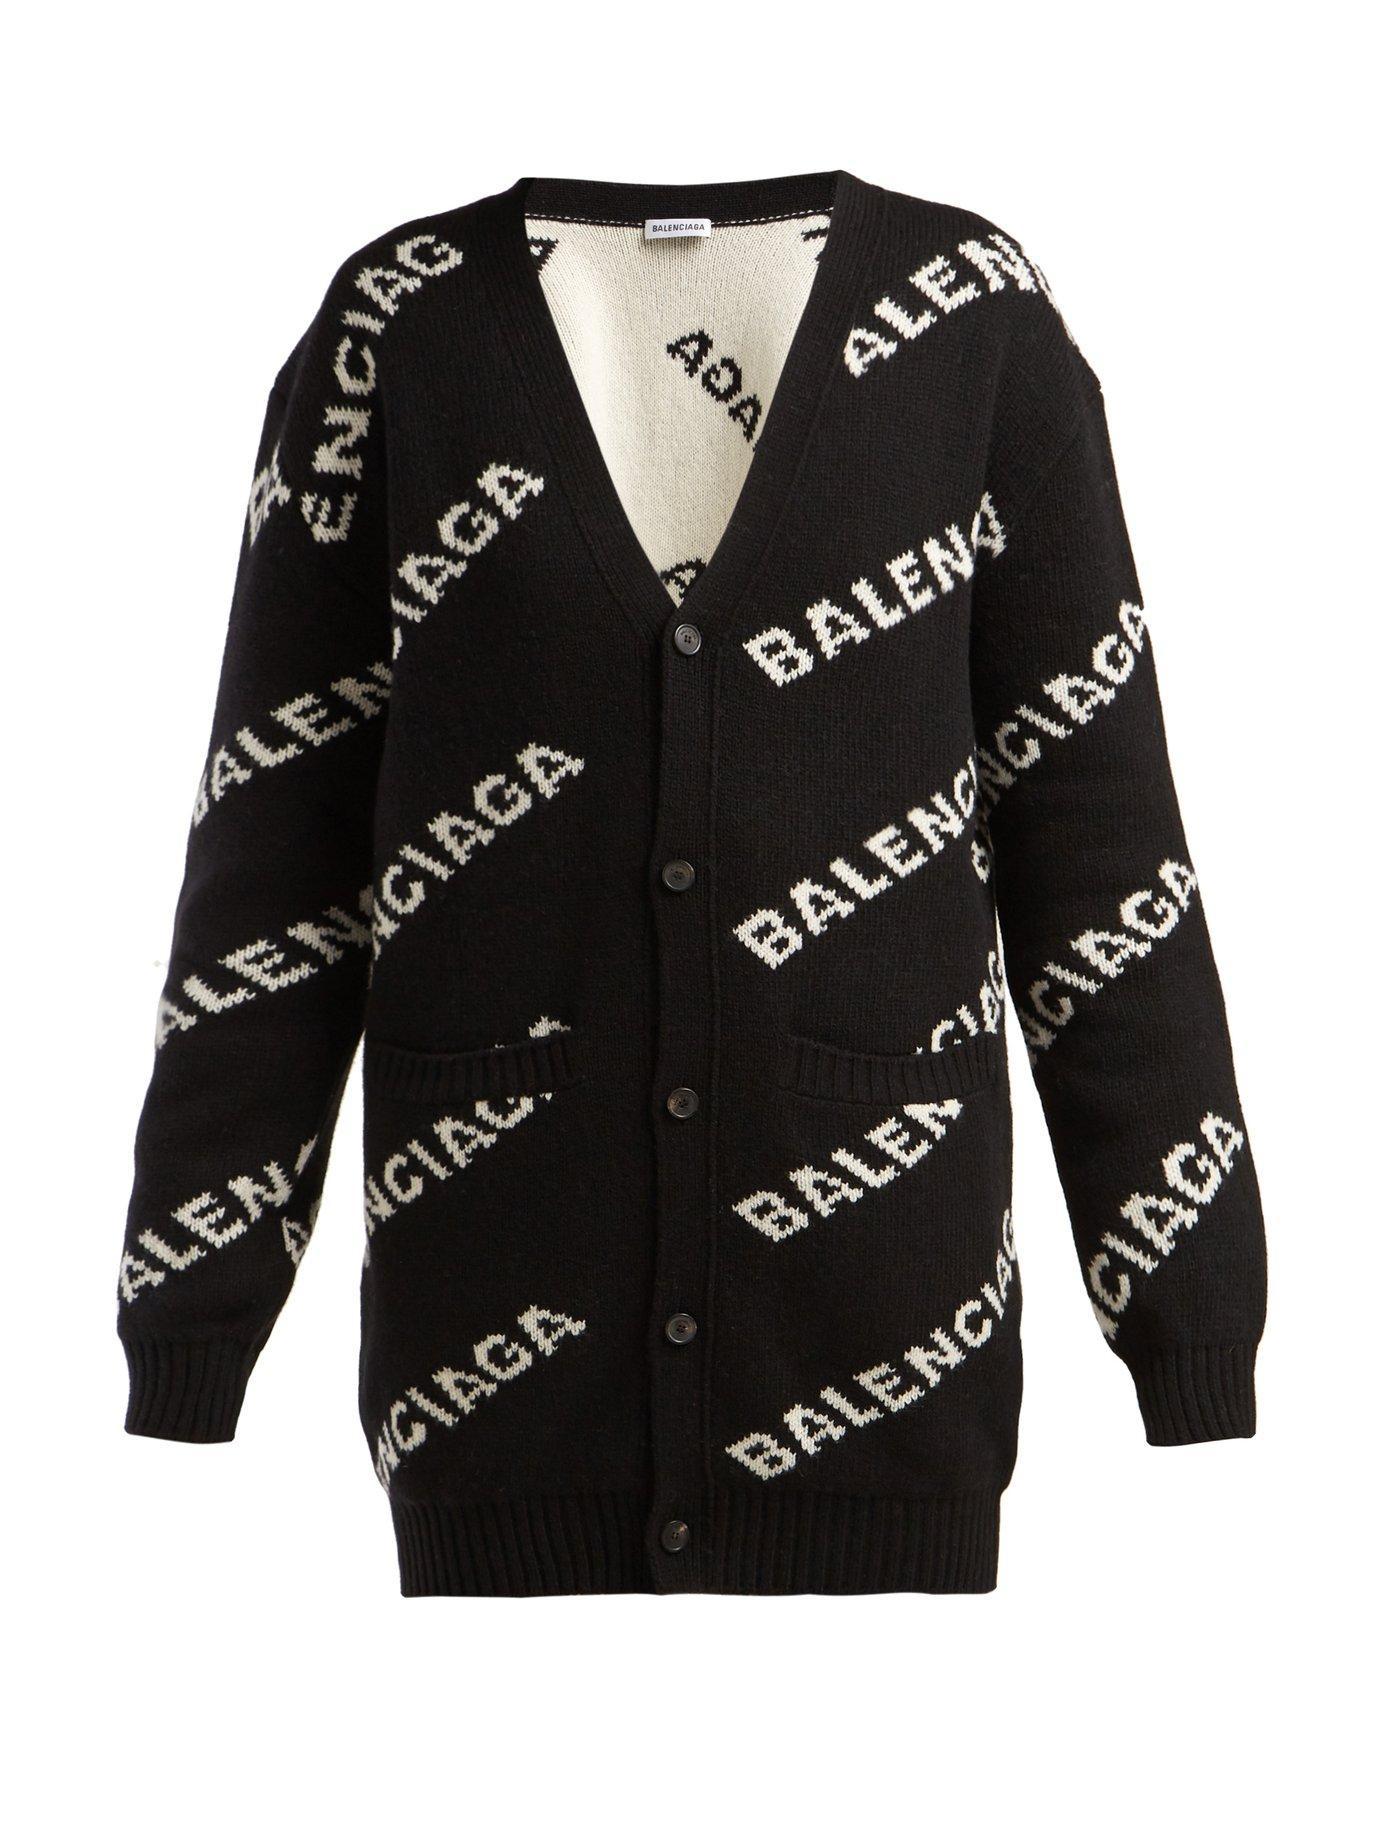 Balenciaga - Black Jacquard Oversized Logo Cardigan - Lyst. View fullscreen 294d34817